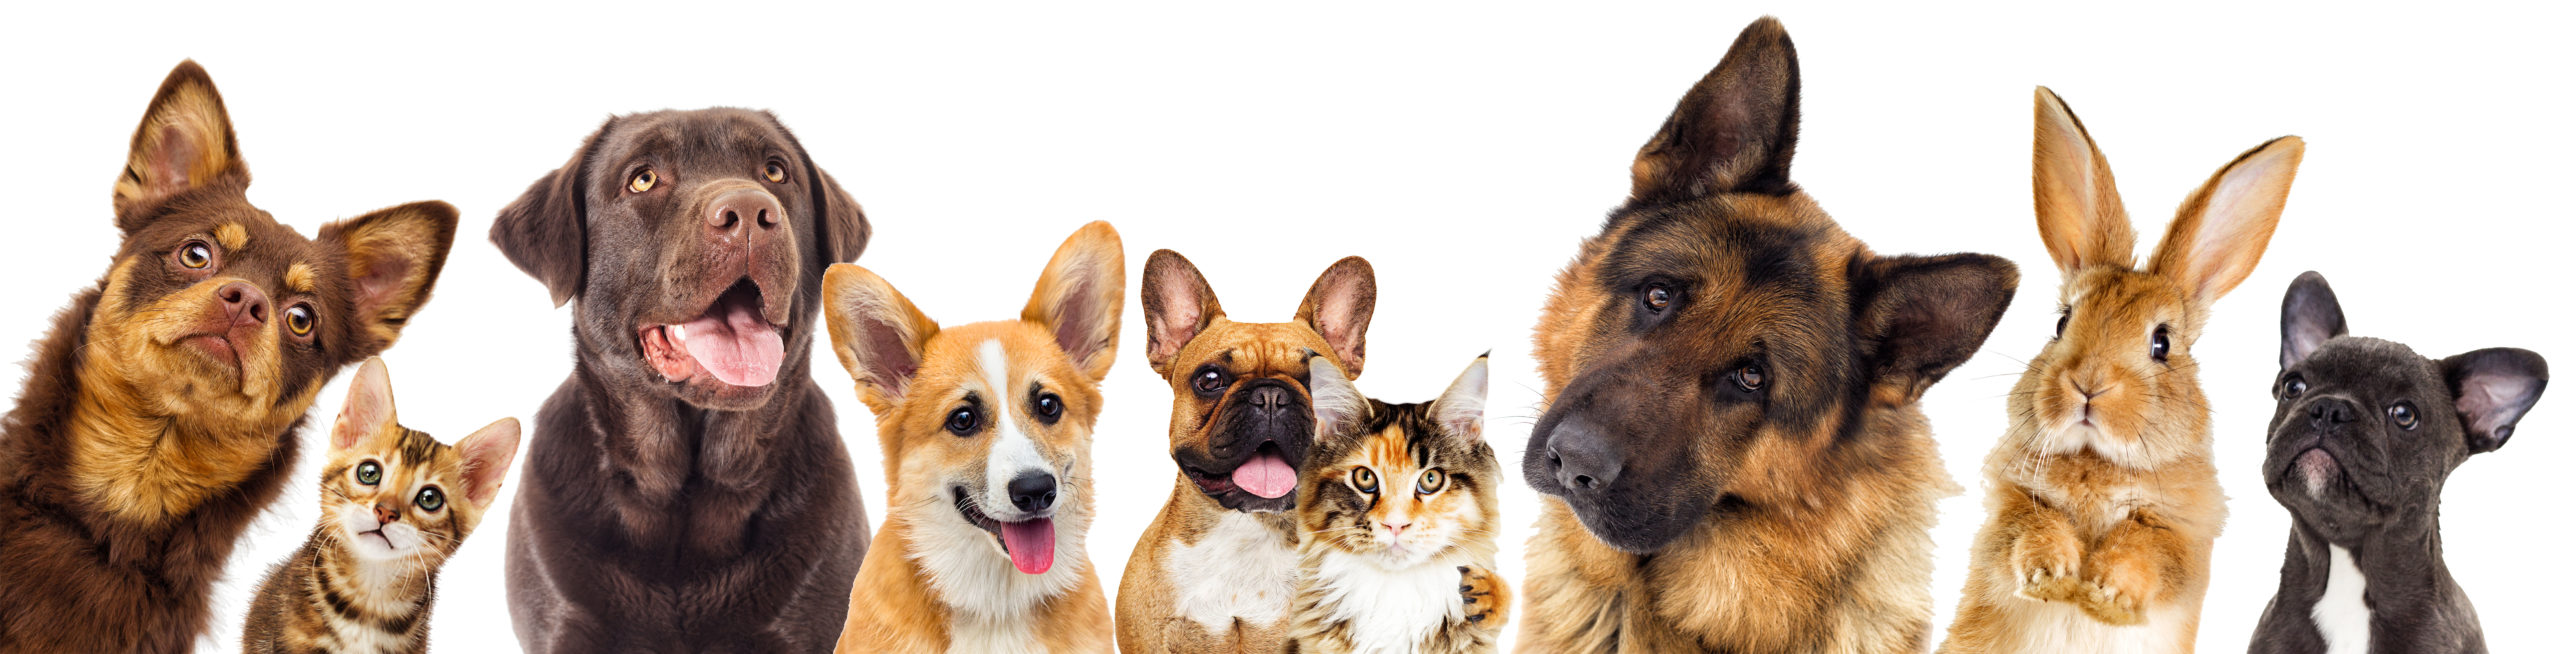 Bottom row of pets